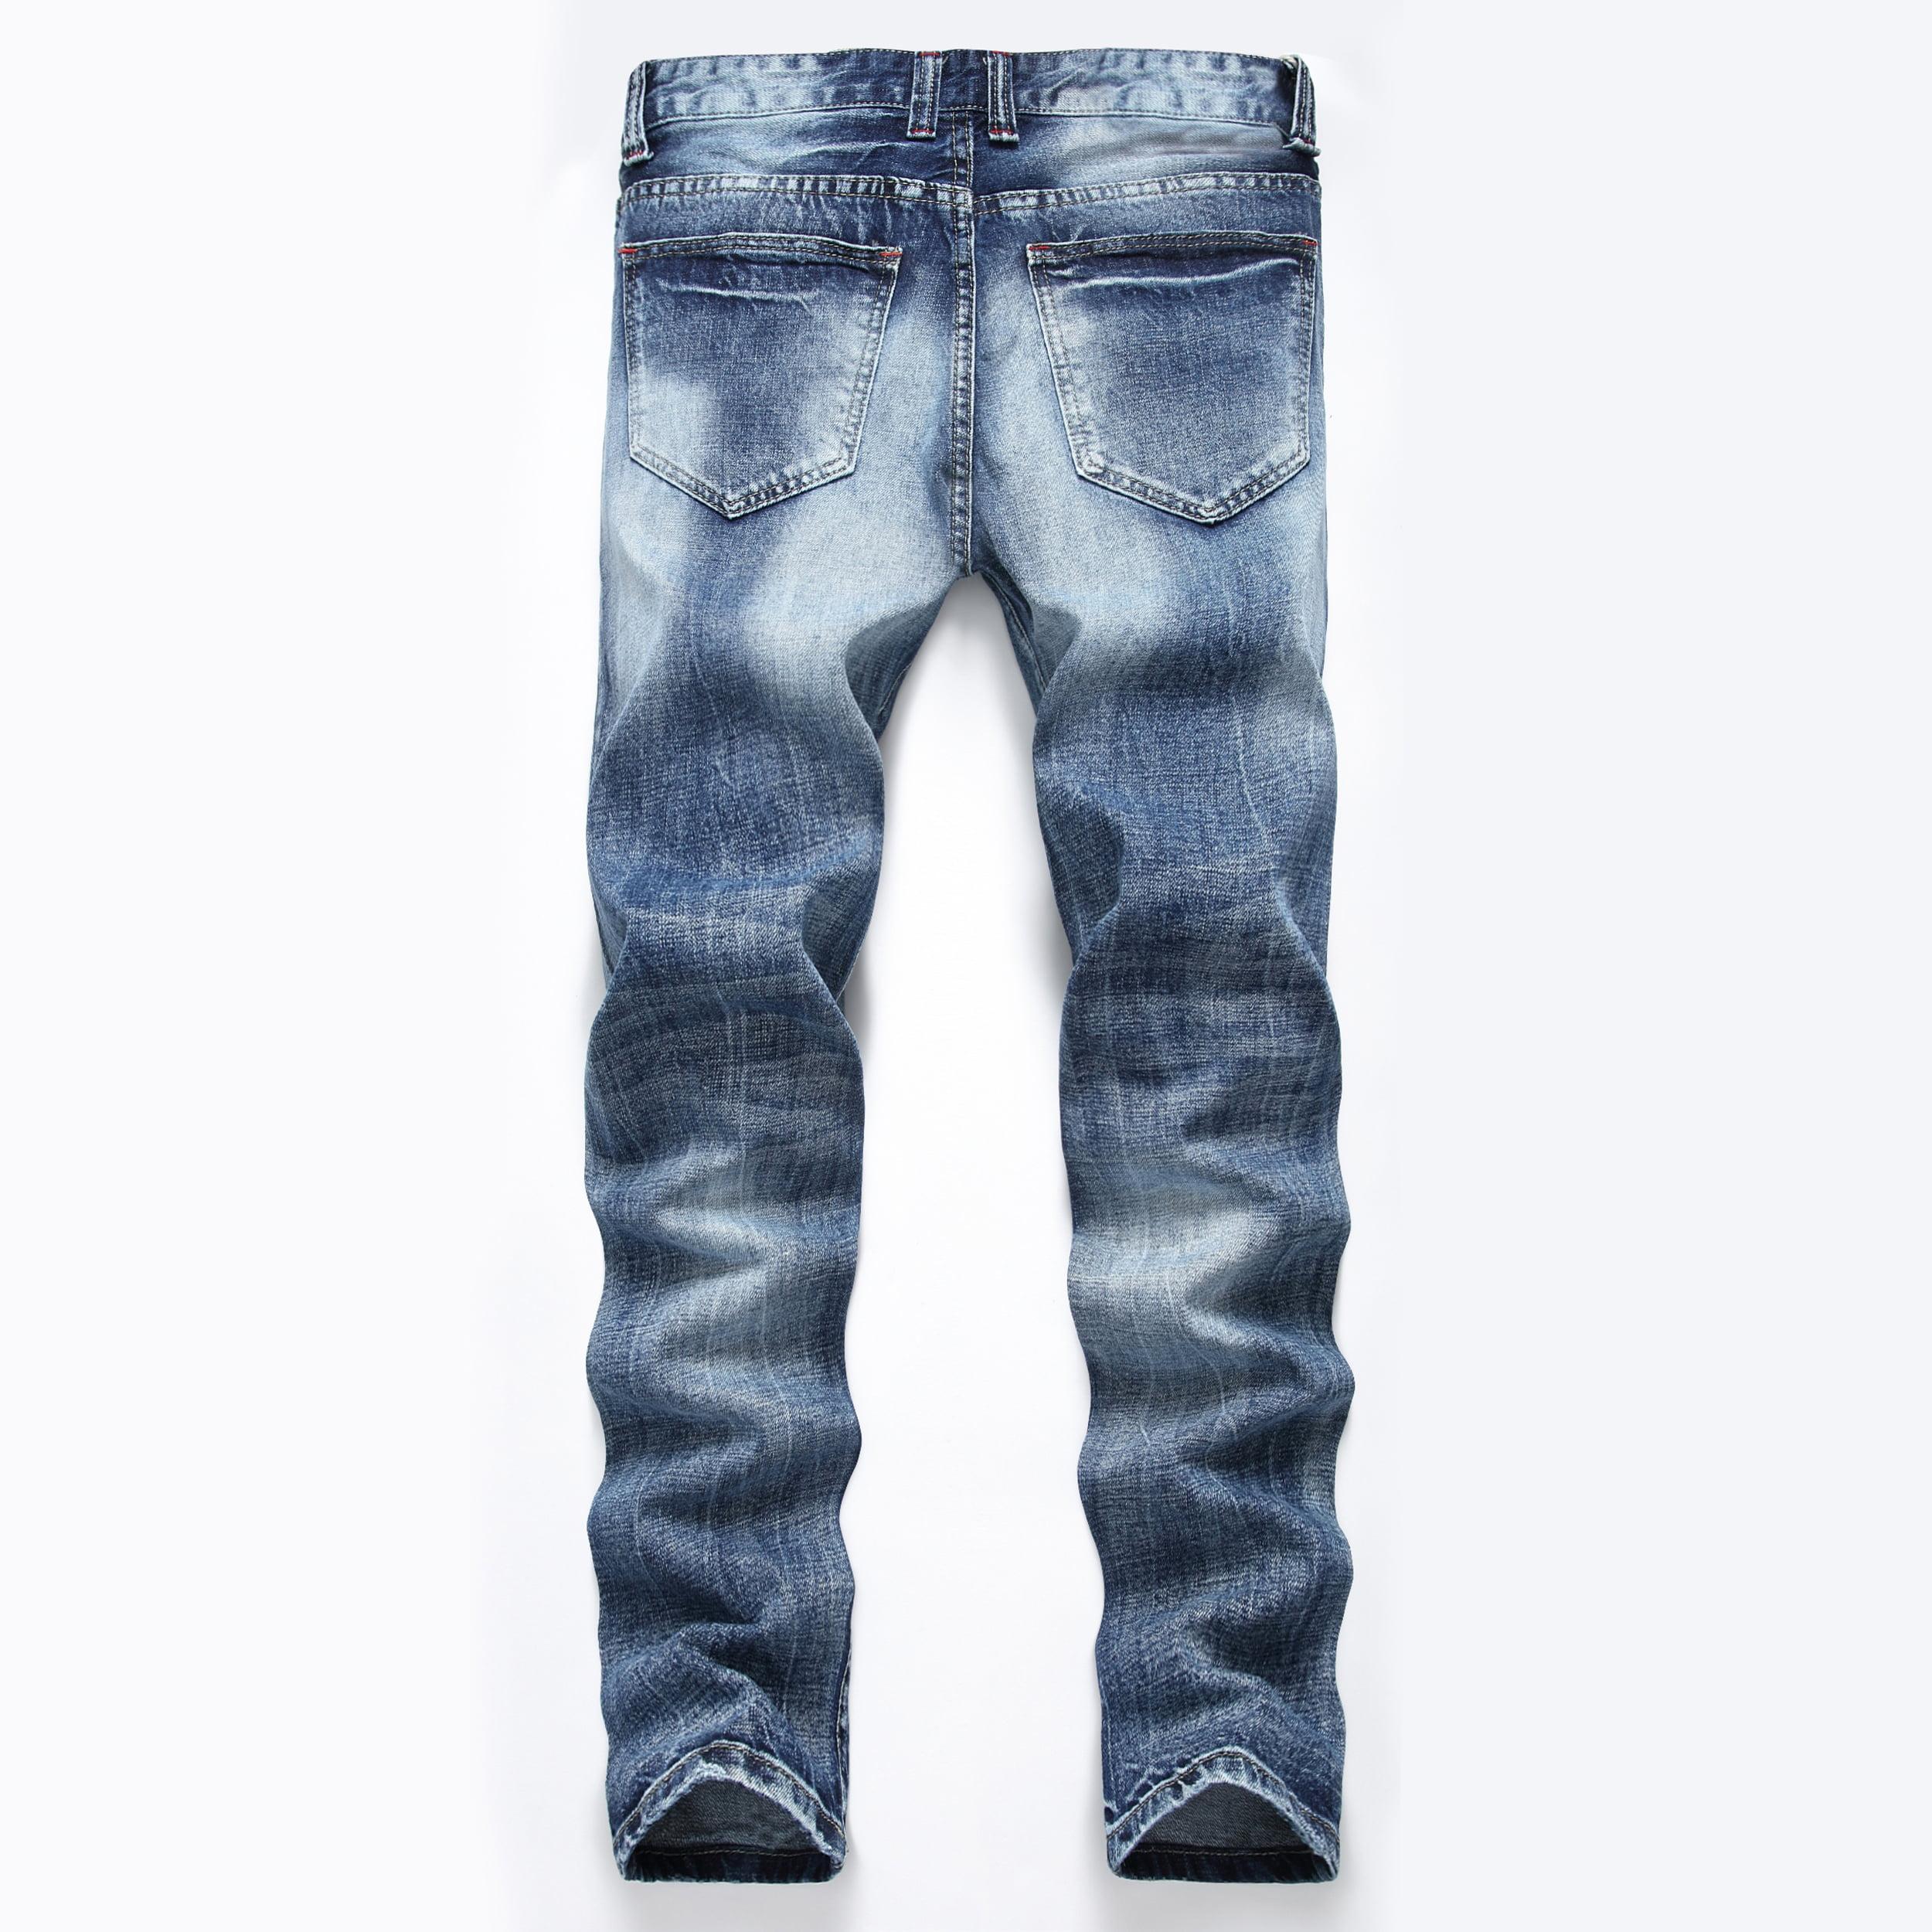 6fa0adda71 Men Plus Size Straight Jeans Male Distressed Denim Pants Biker Jeans Ro  Designer Bin Jeans for Men Religious Outfits - Walmart.com